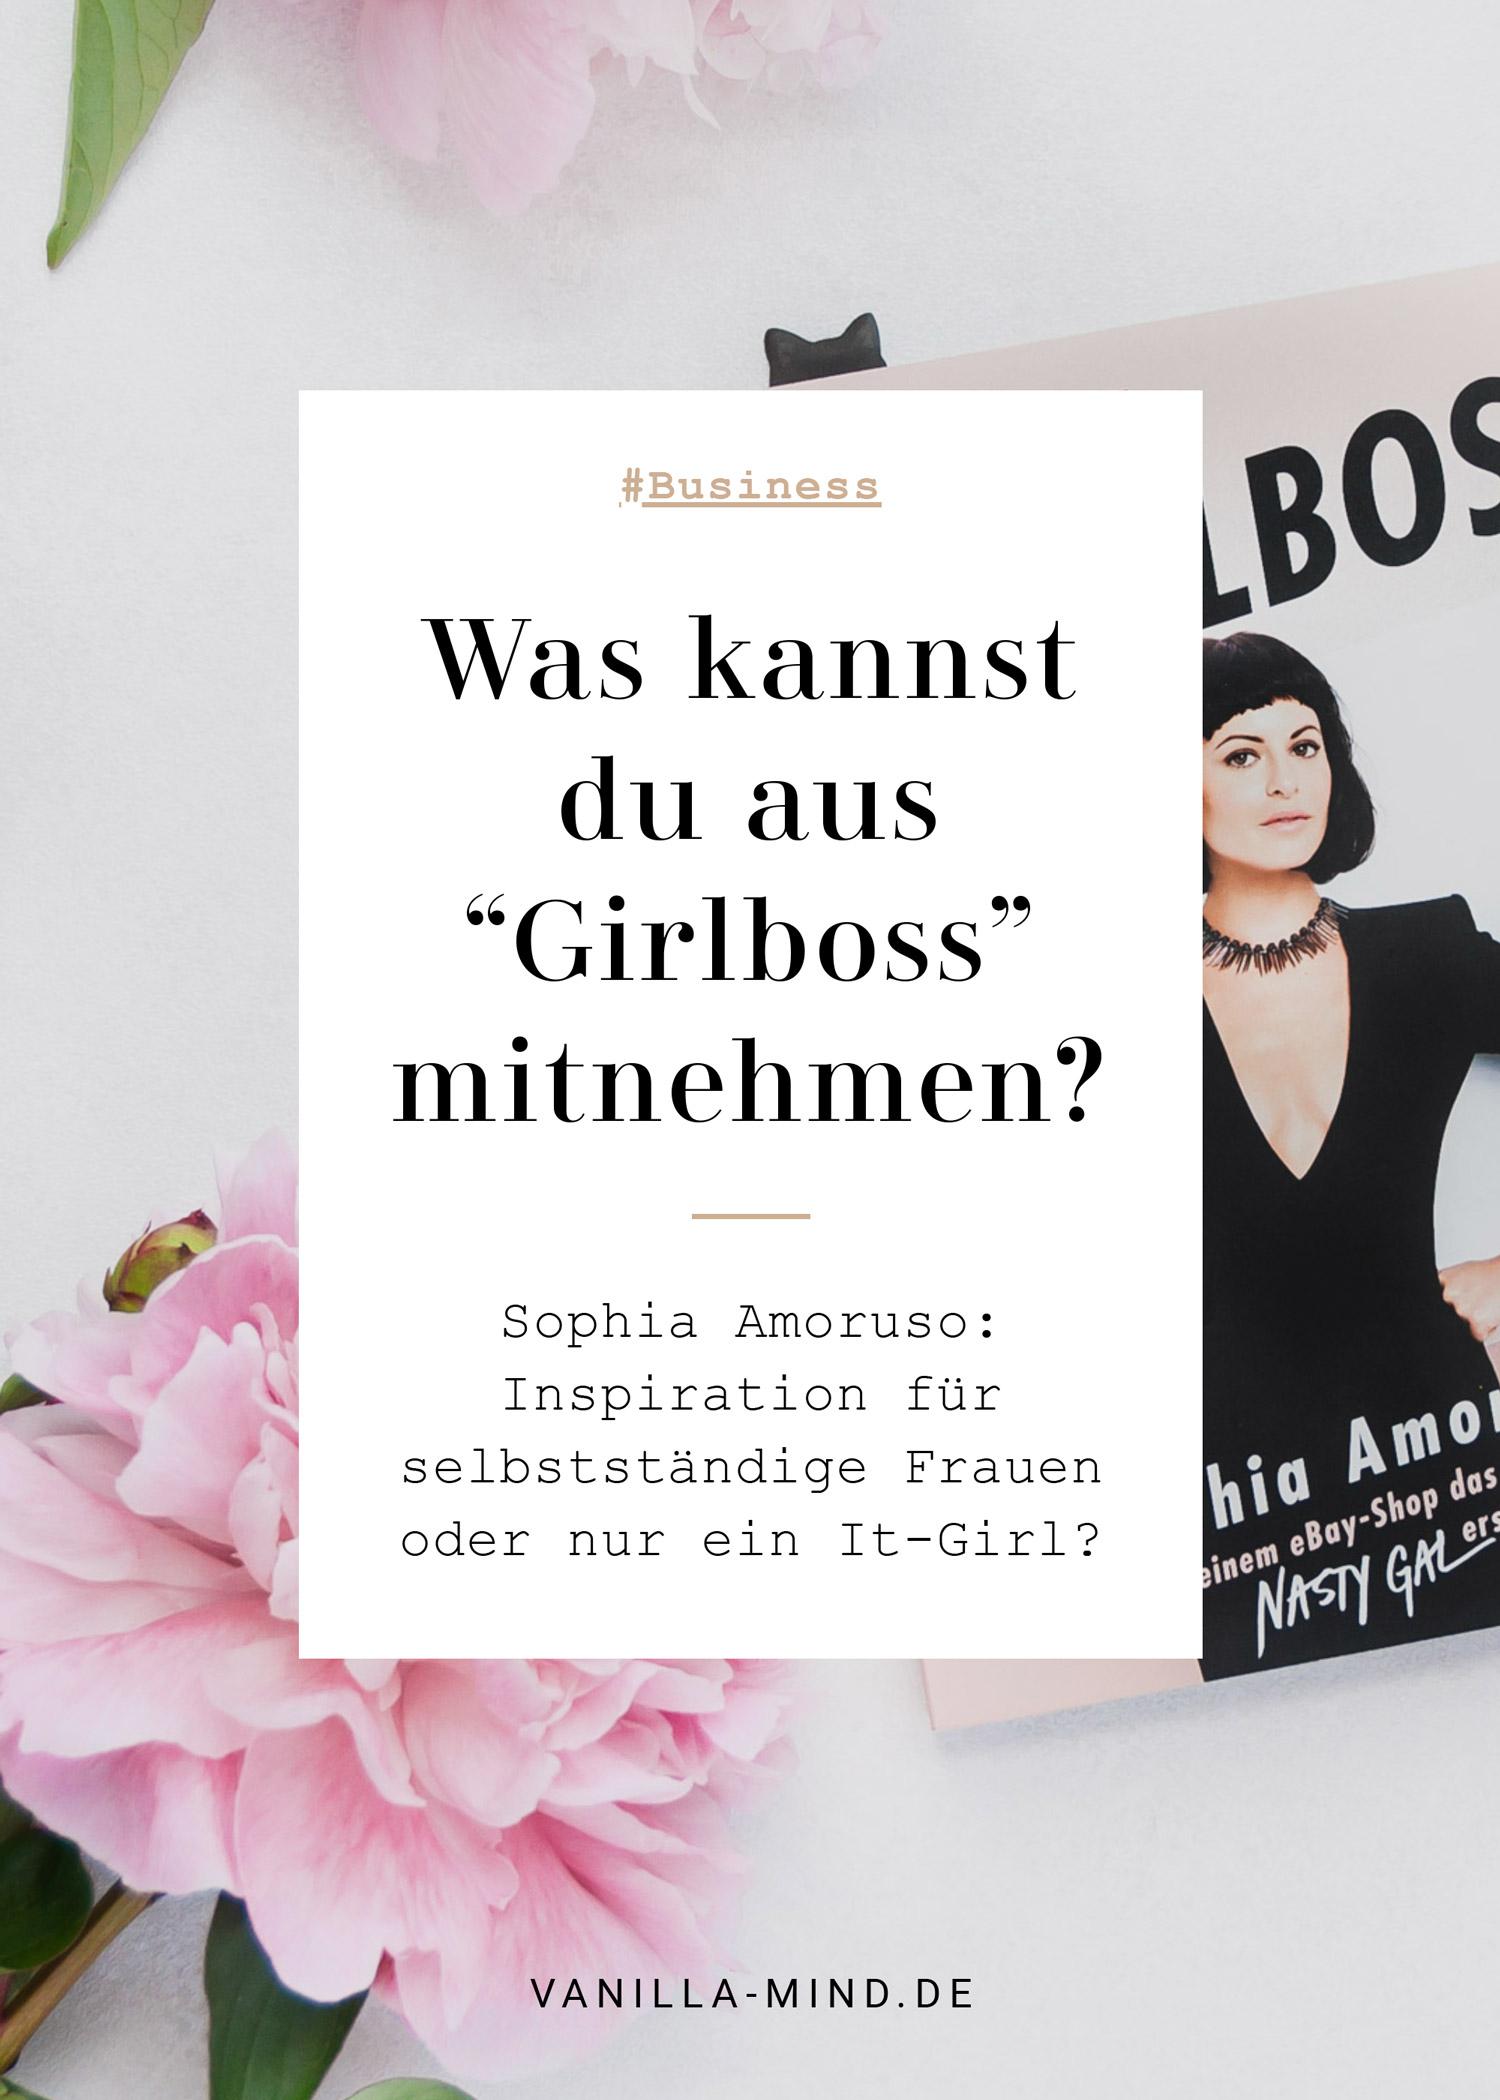 #Girlboss Sophia Amoruso – Inspiration oder eher nicht? #Buchtipp #Freelancer